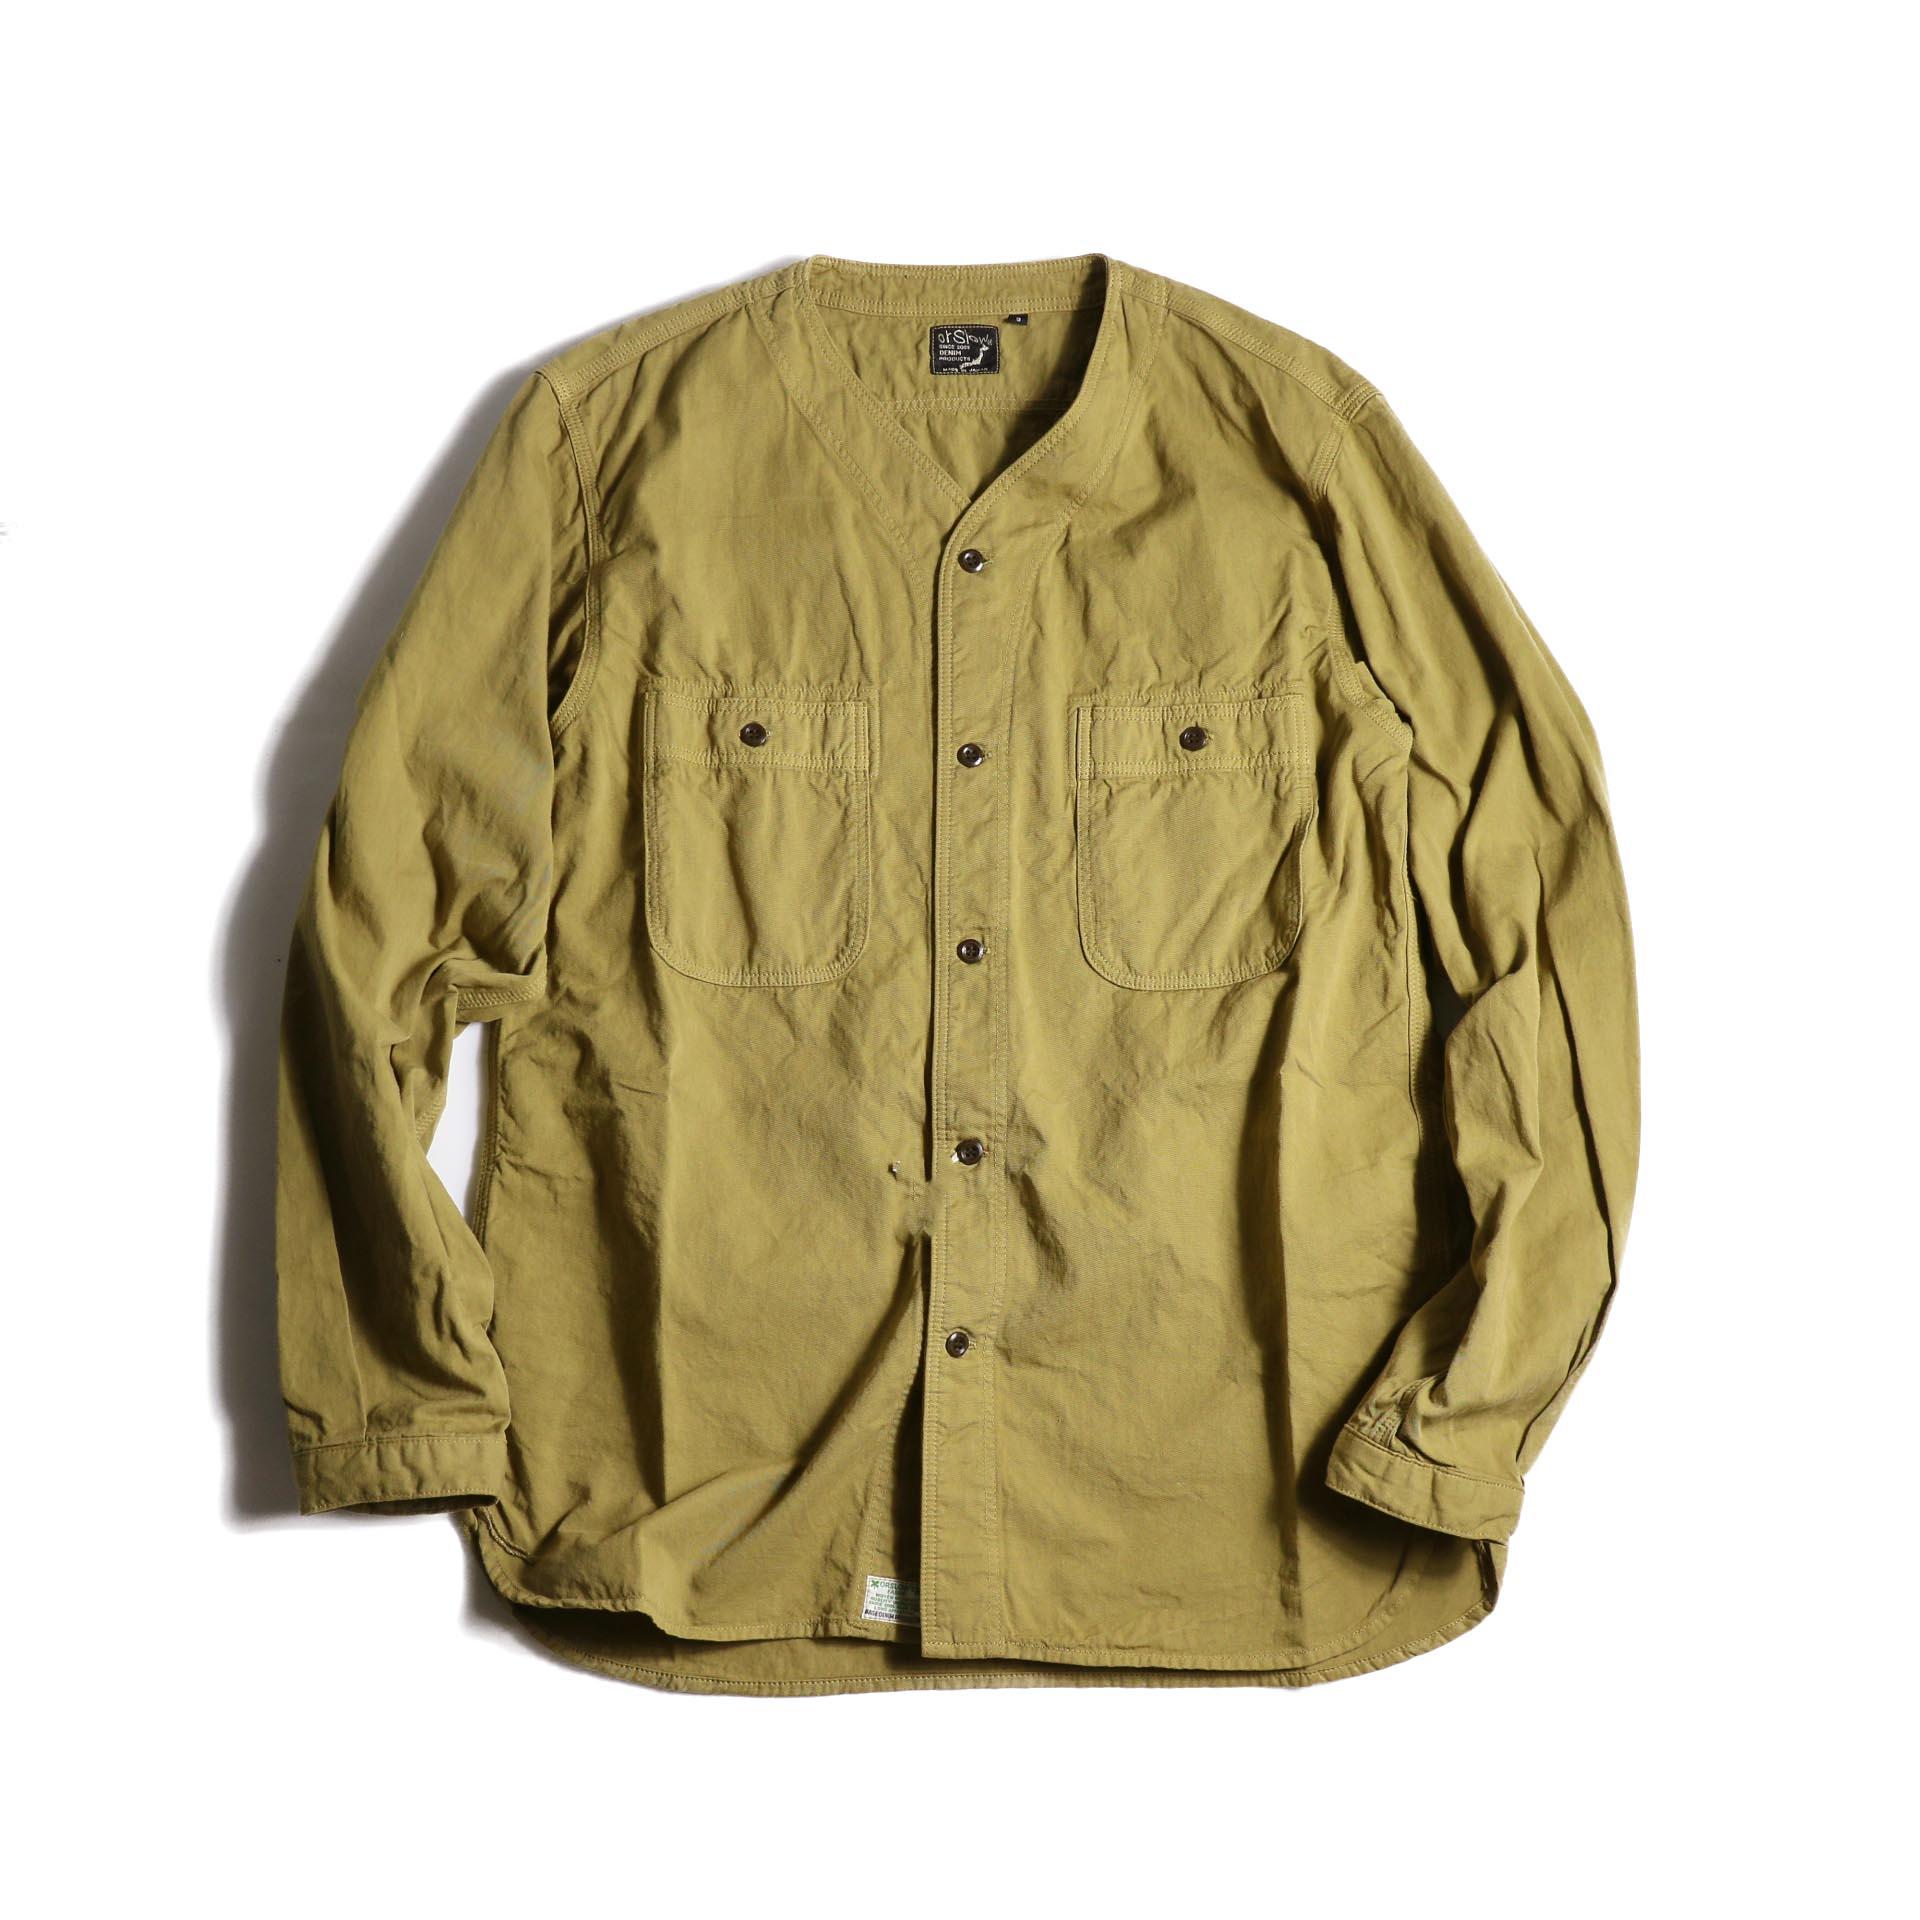 orSlow / NO COLLAR SHIRT (Khaki)